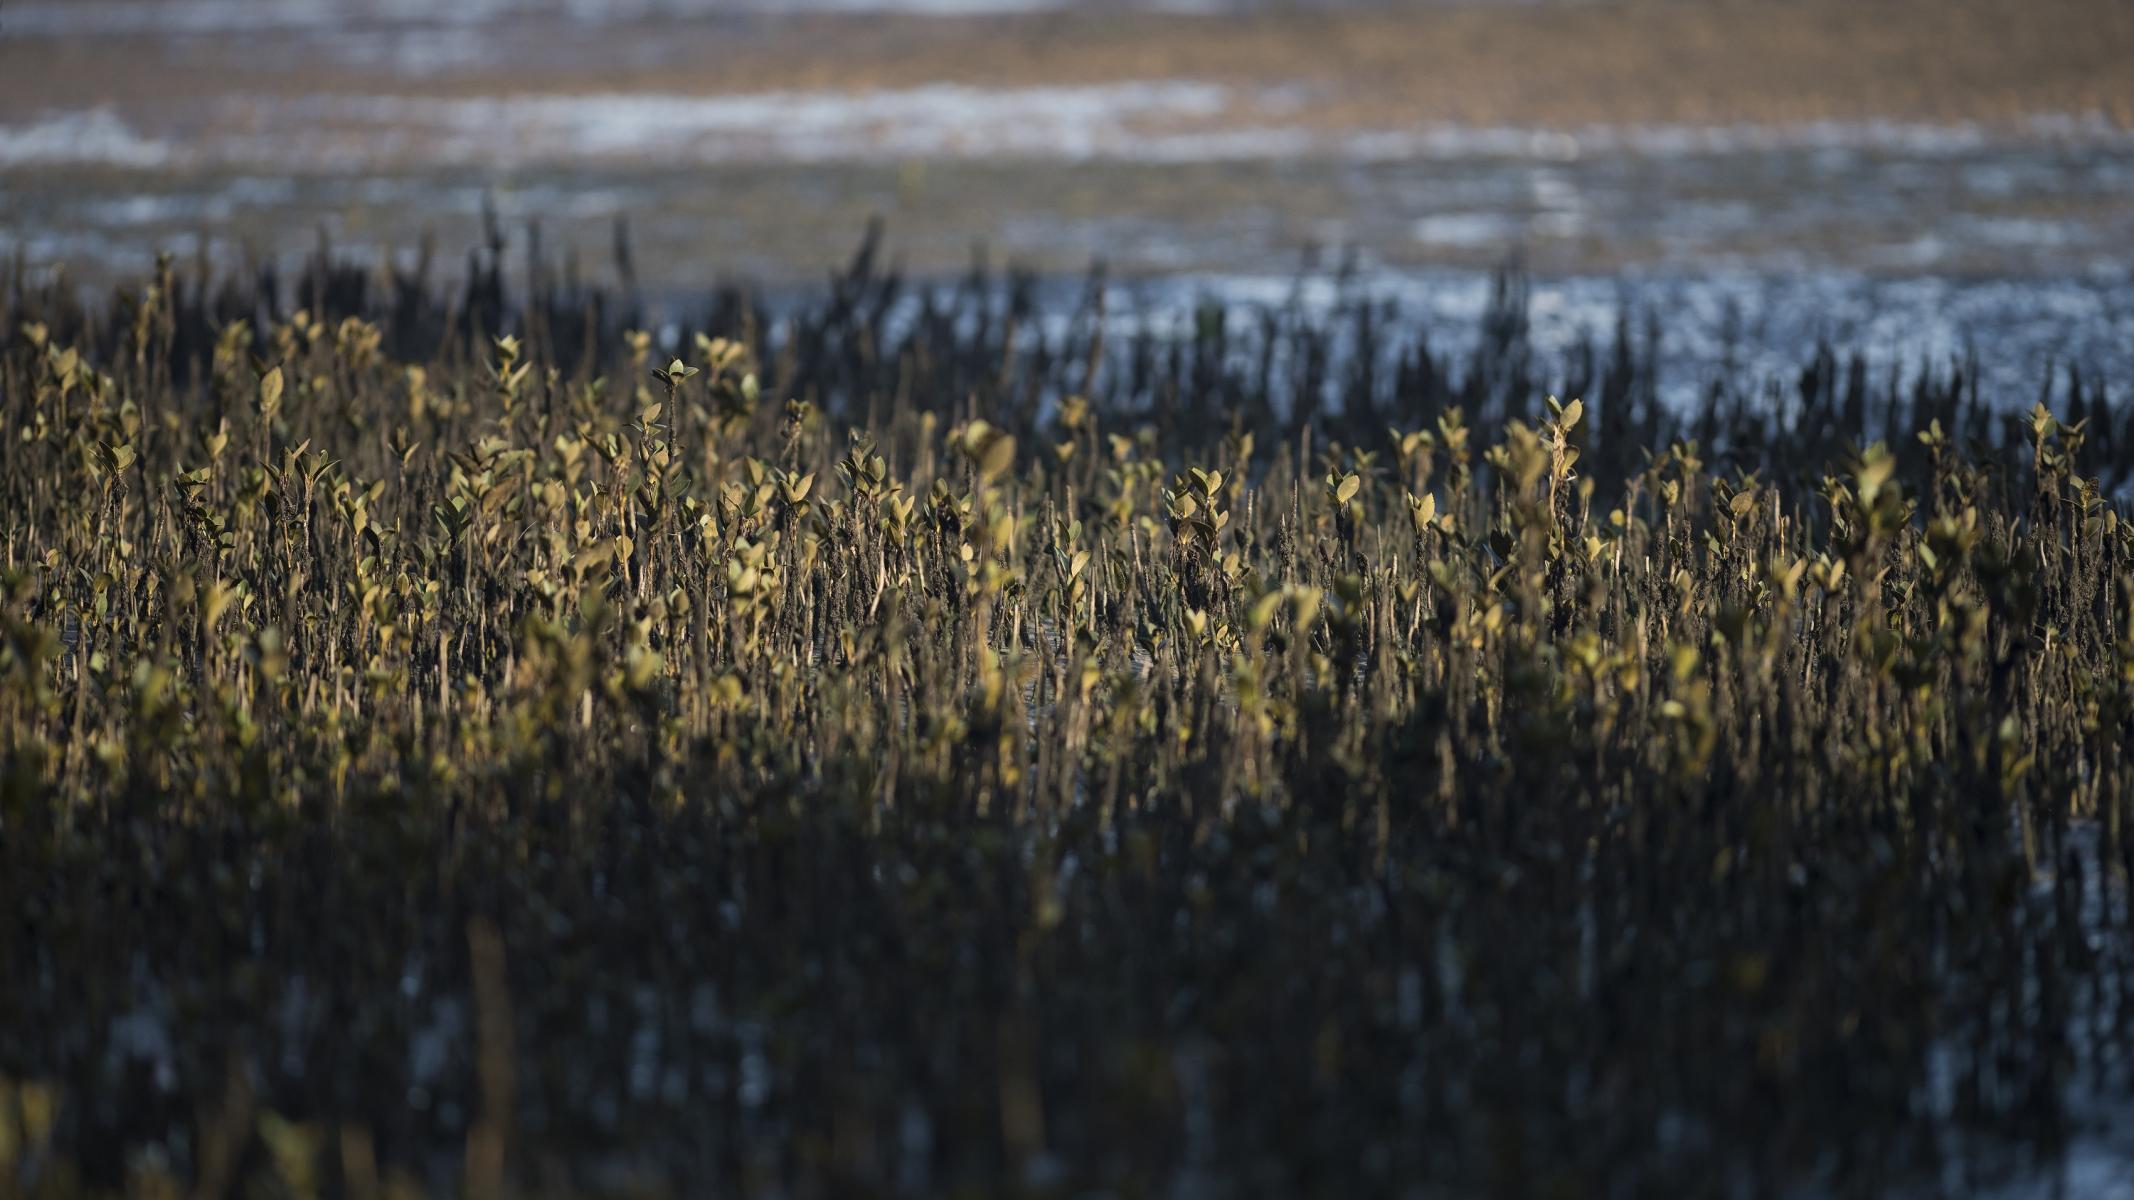 Avicennia marina: mangrove